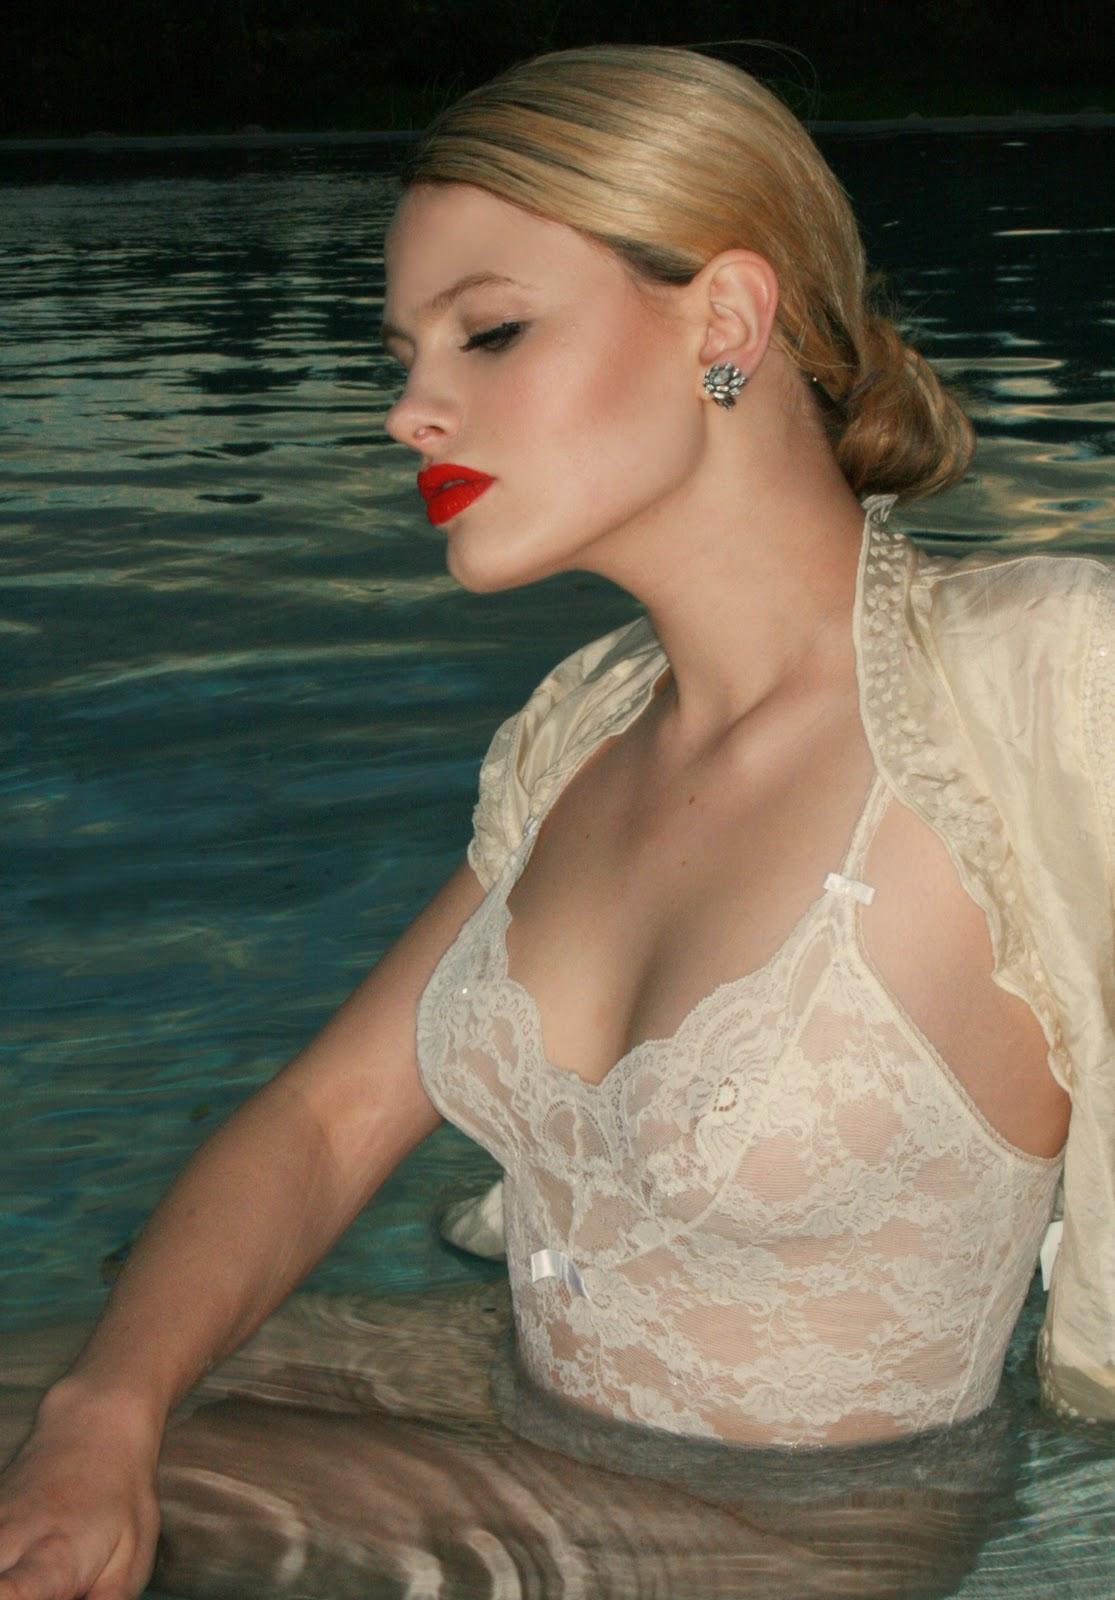 Chloe-Jasmine Whichello Nude Photos